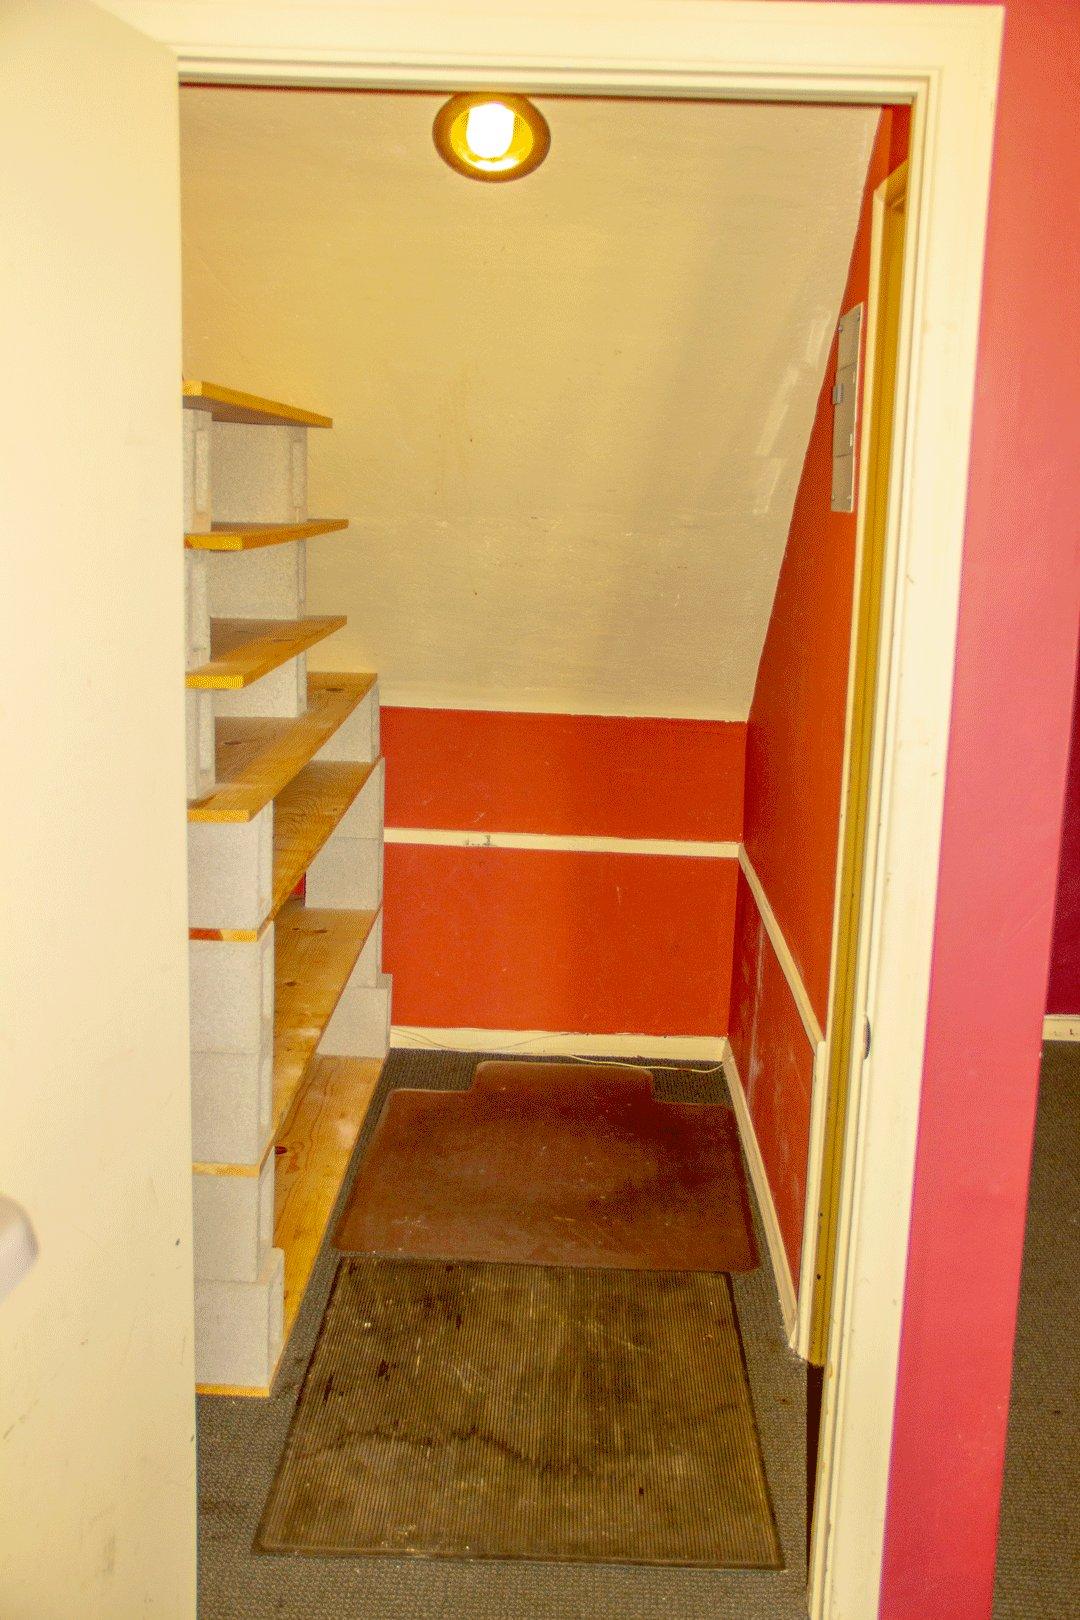 3x10 Closet self storage unit